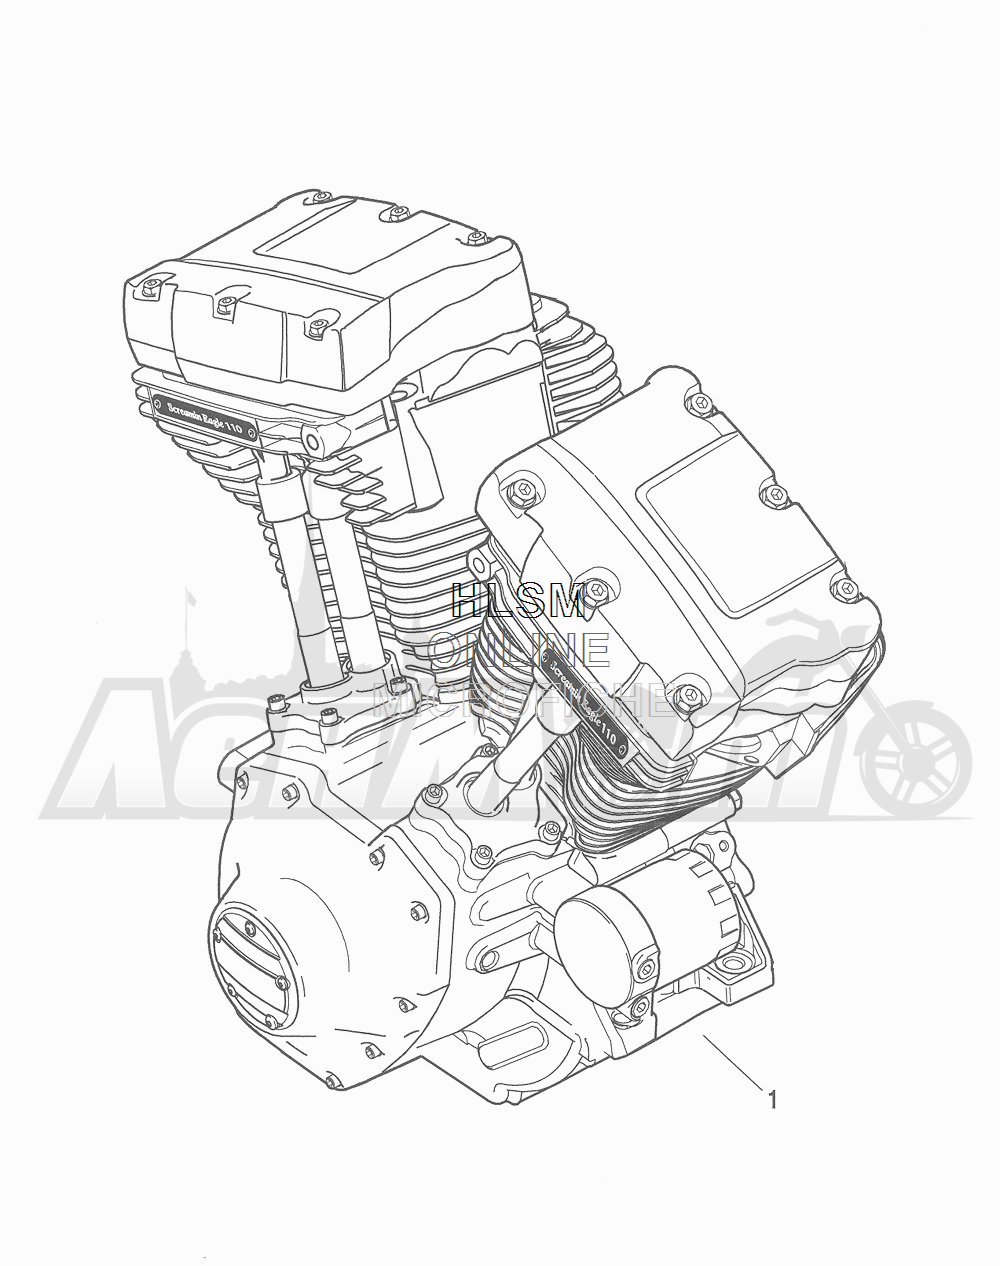 Запчасти для Мотоцикла Harley-Davidson 2016 CVO ROAD GLIDE ULTRA (TA) Раздел: ENGINE ASSEMBLY | двигатель в сборе